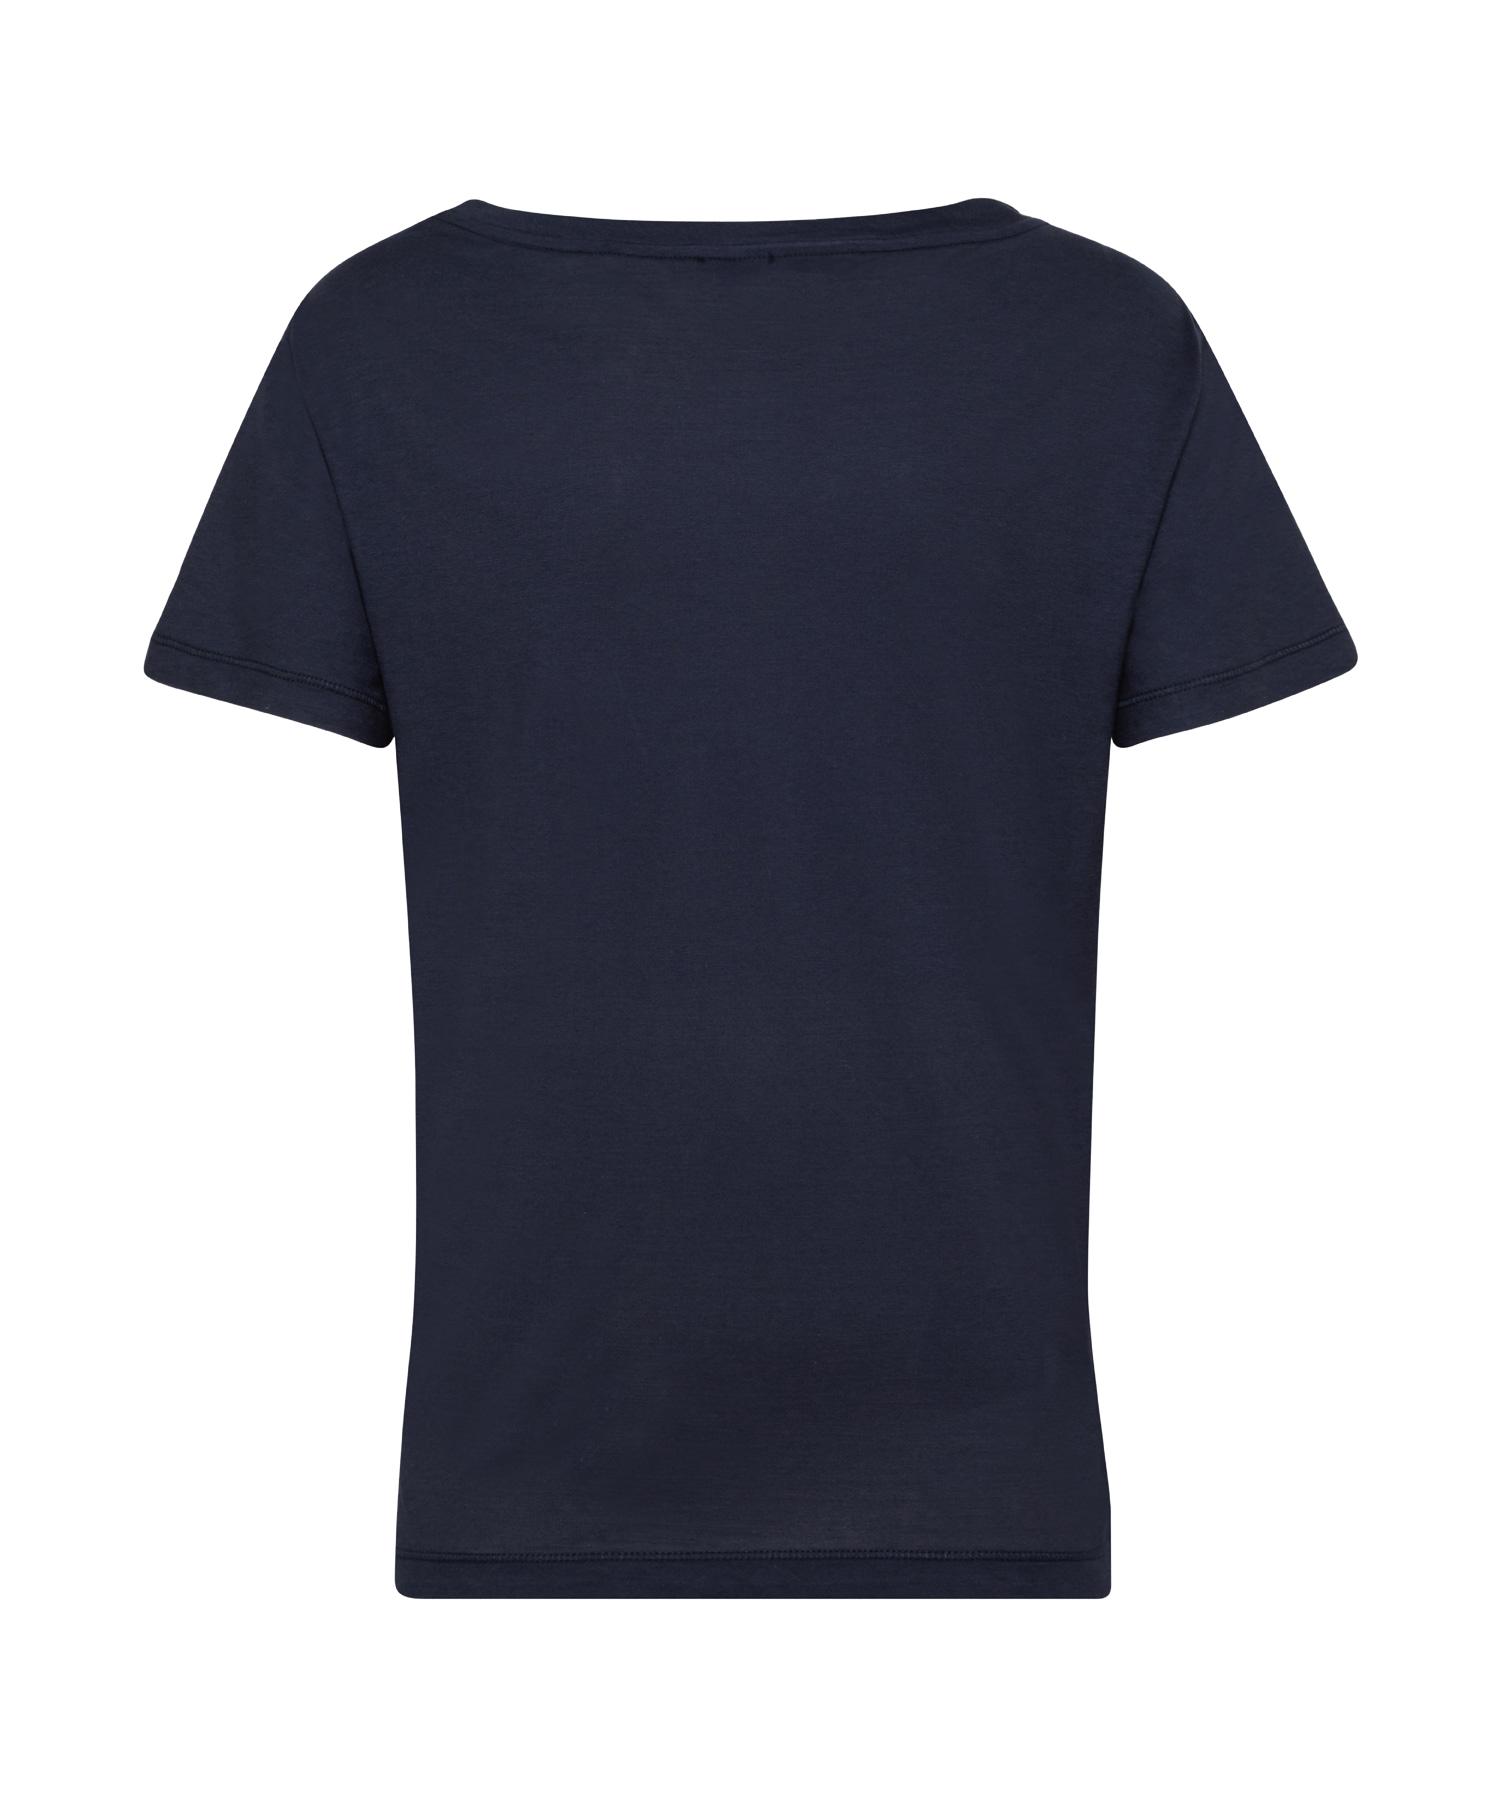 BRETAGNA PRINT T-SHIRT PEUTEREY   T-shirts   PED3242 99011617215